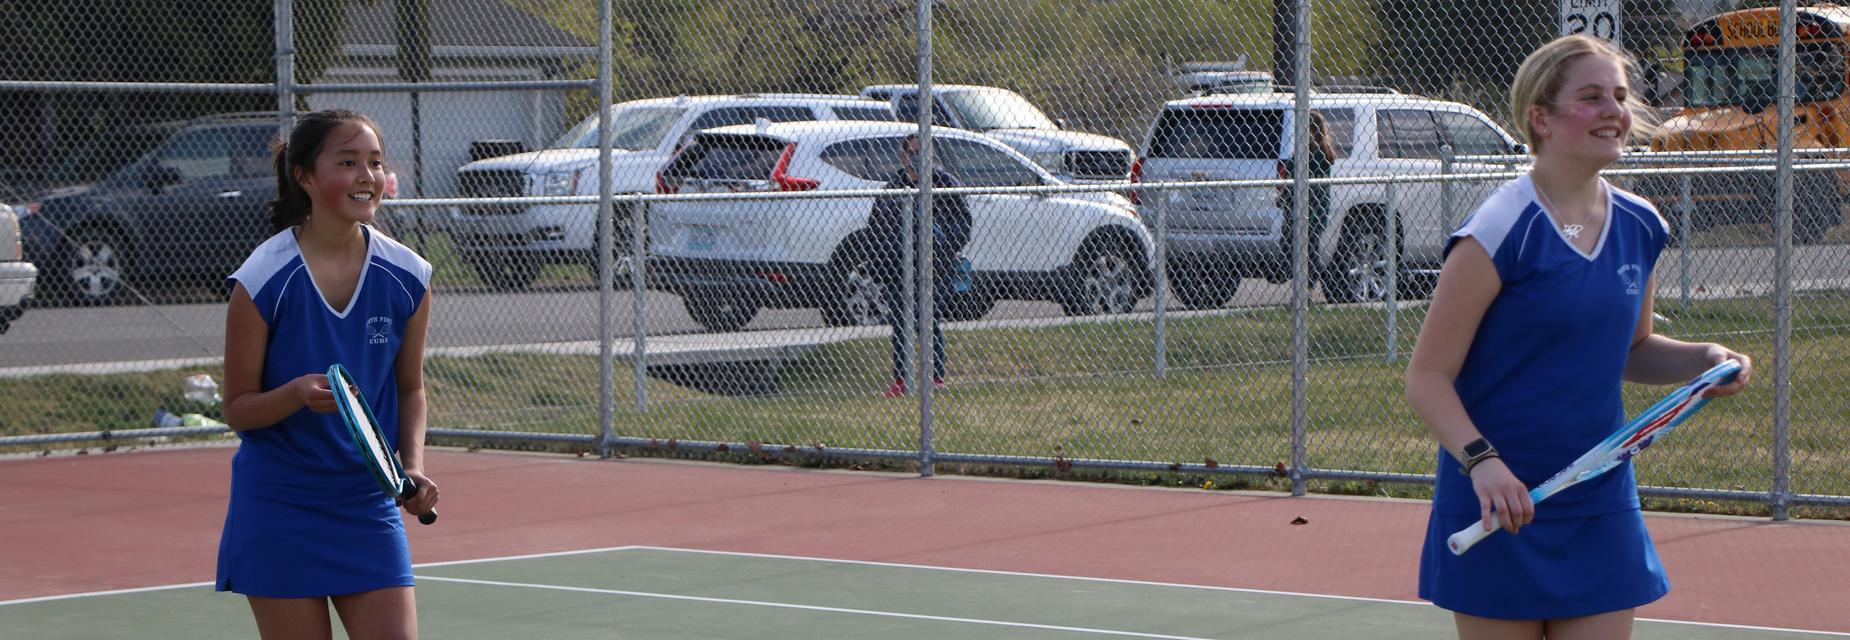 North Pines Tennis